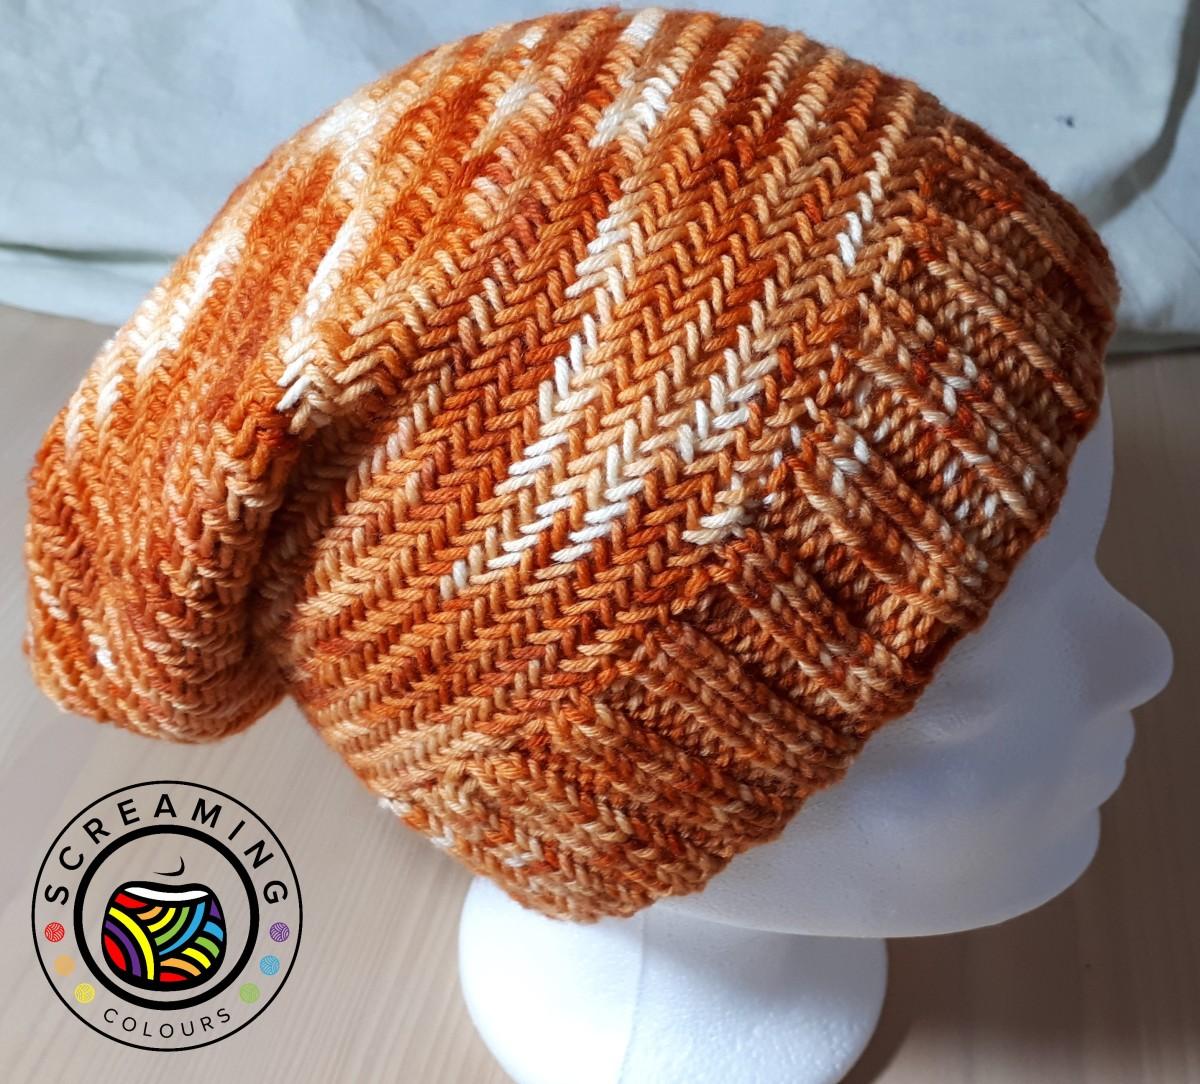 Weavers Beanie